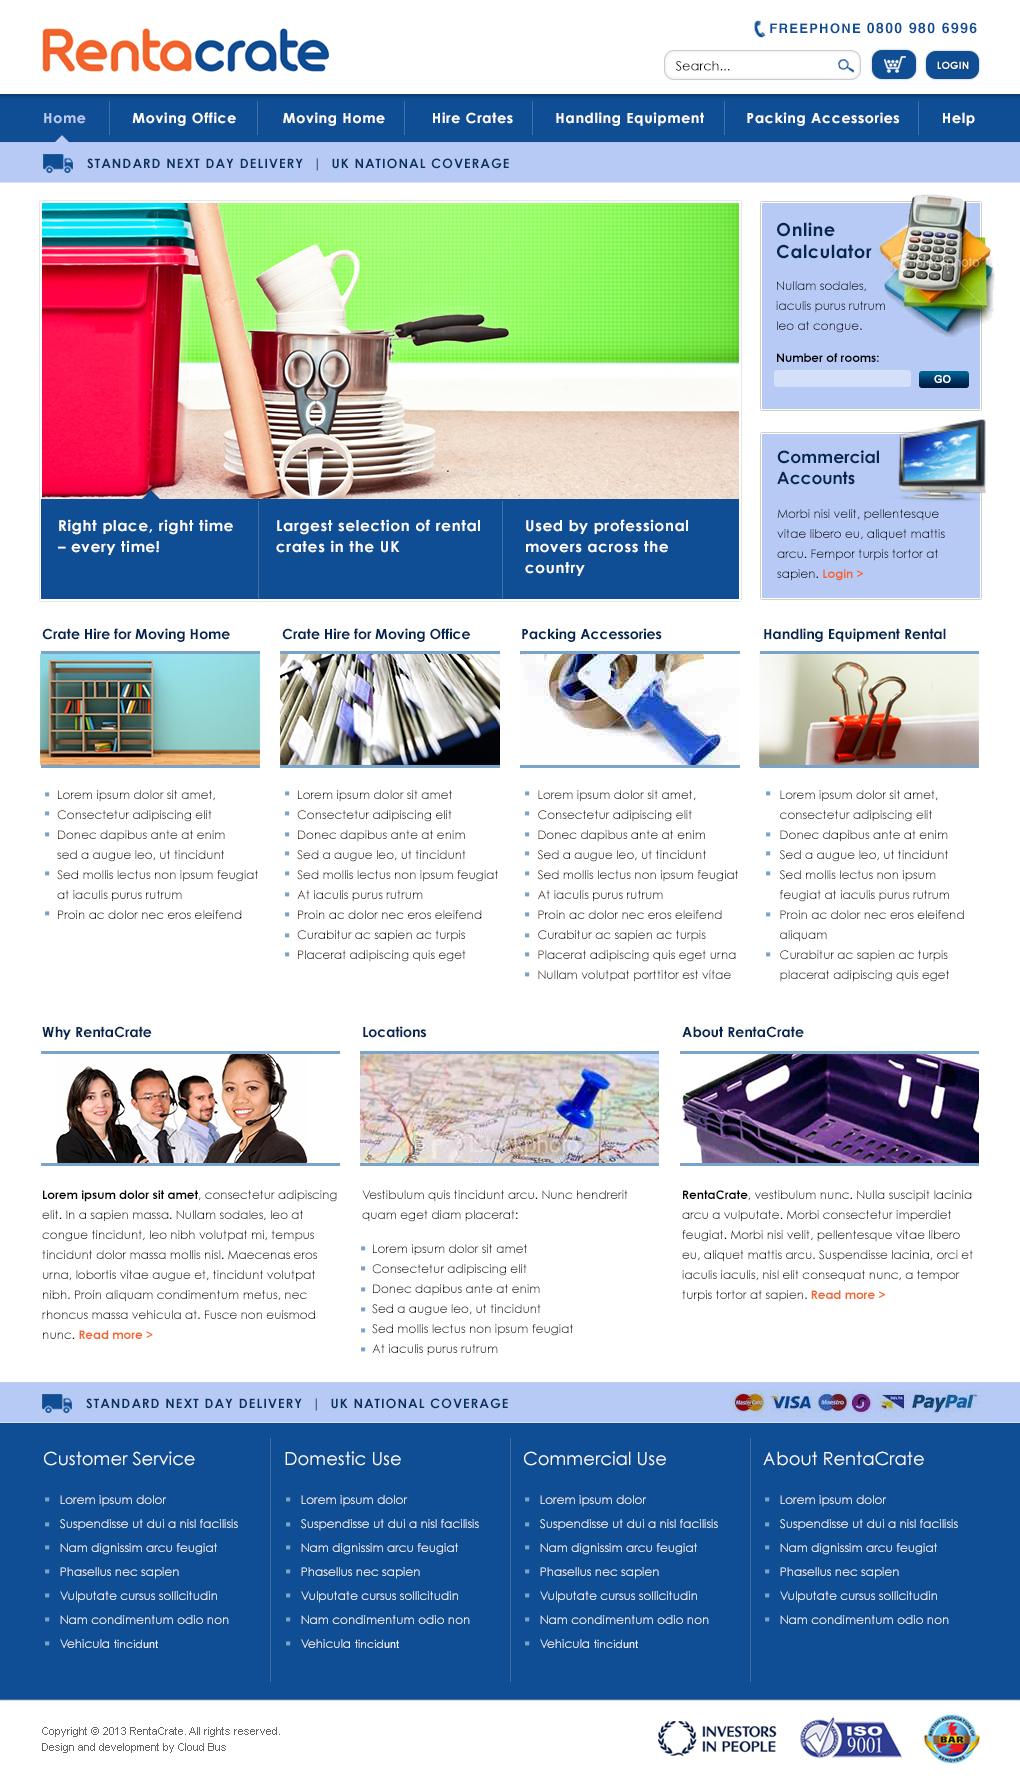 Rentacrate homepage